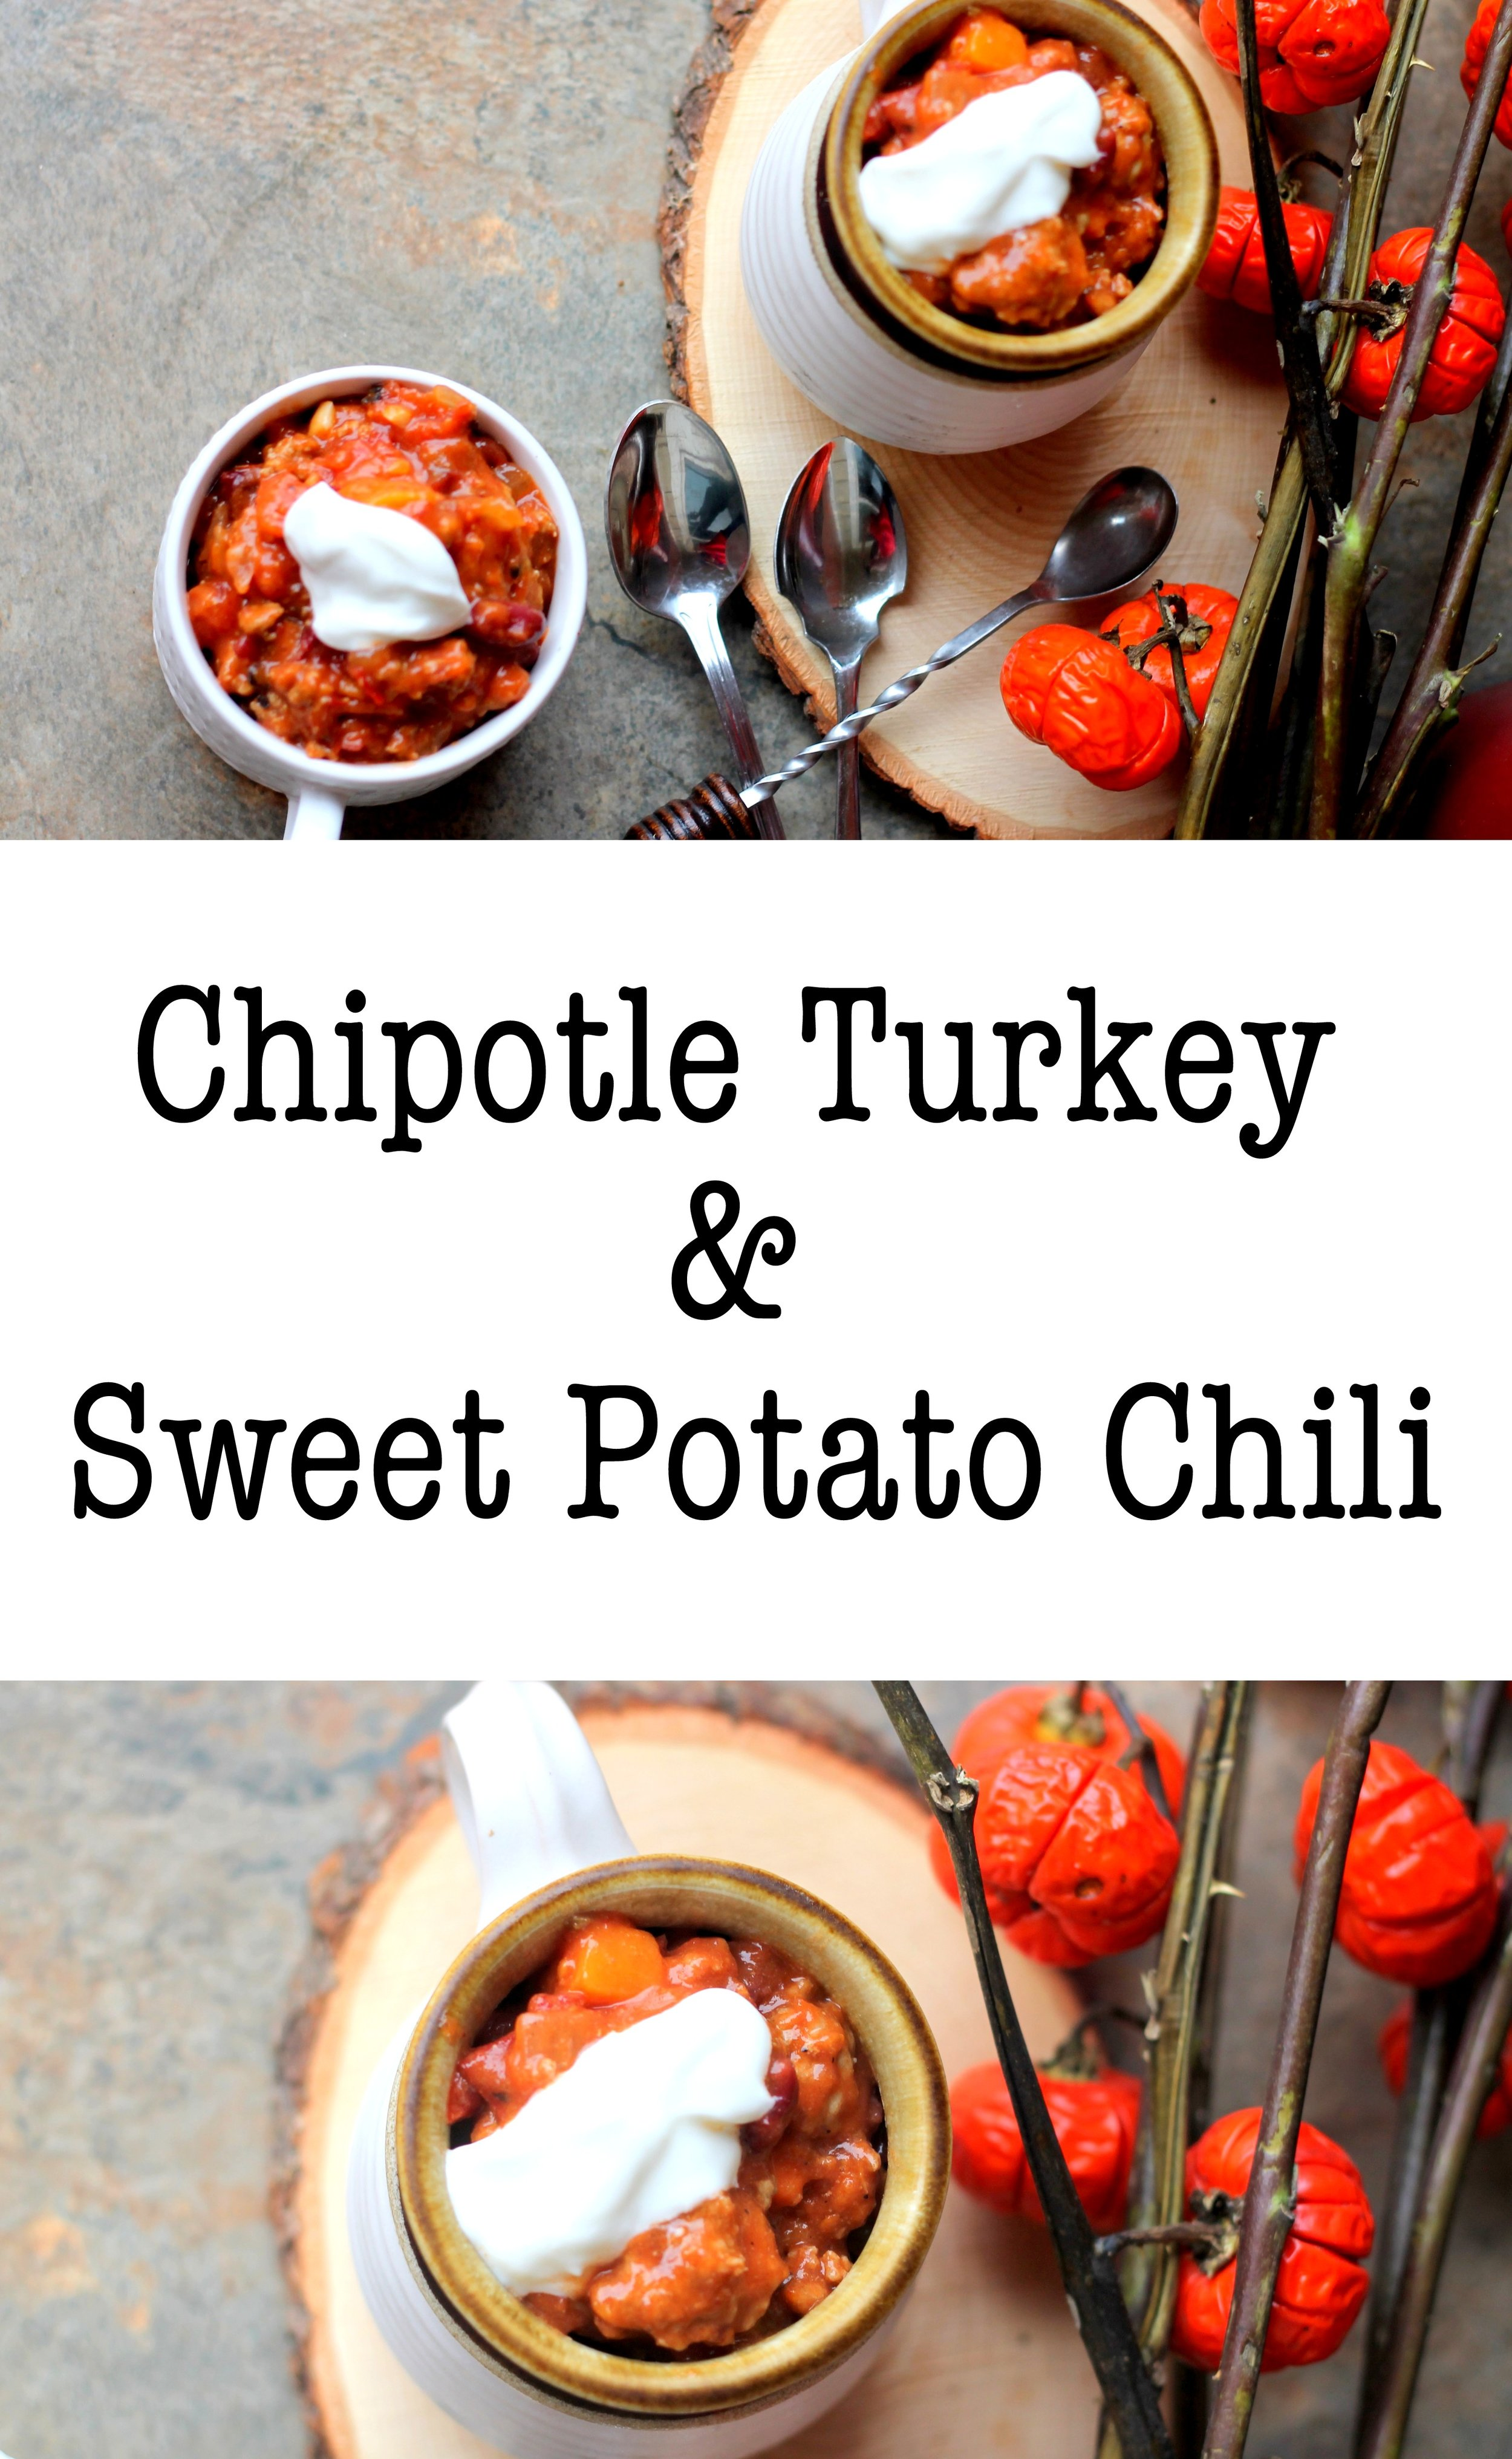 chipotle turkey and sweet potato chili7